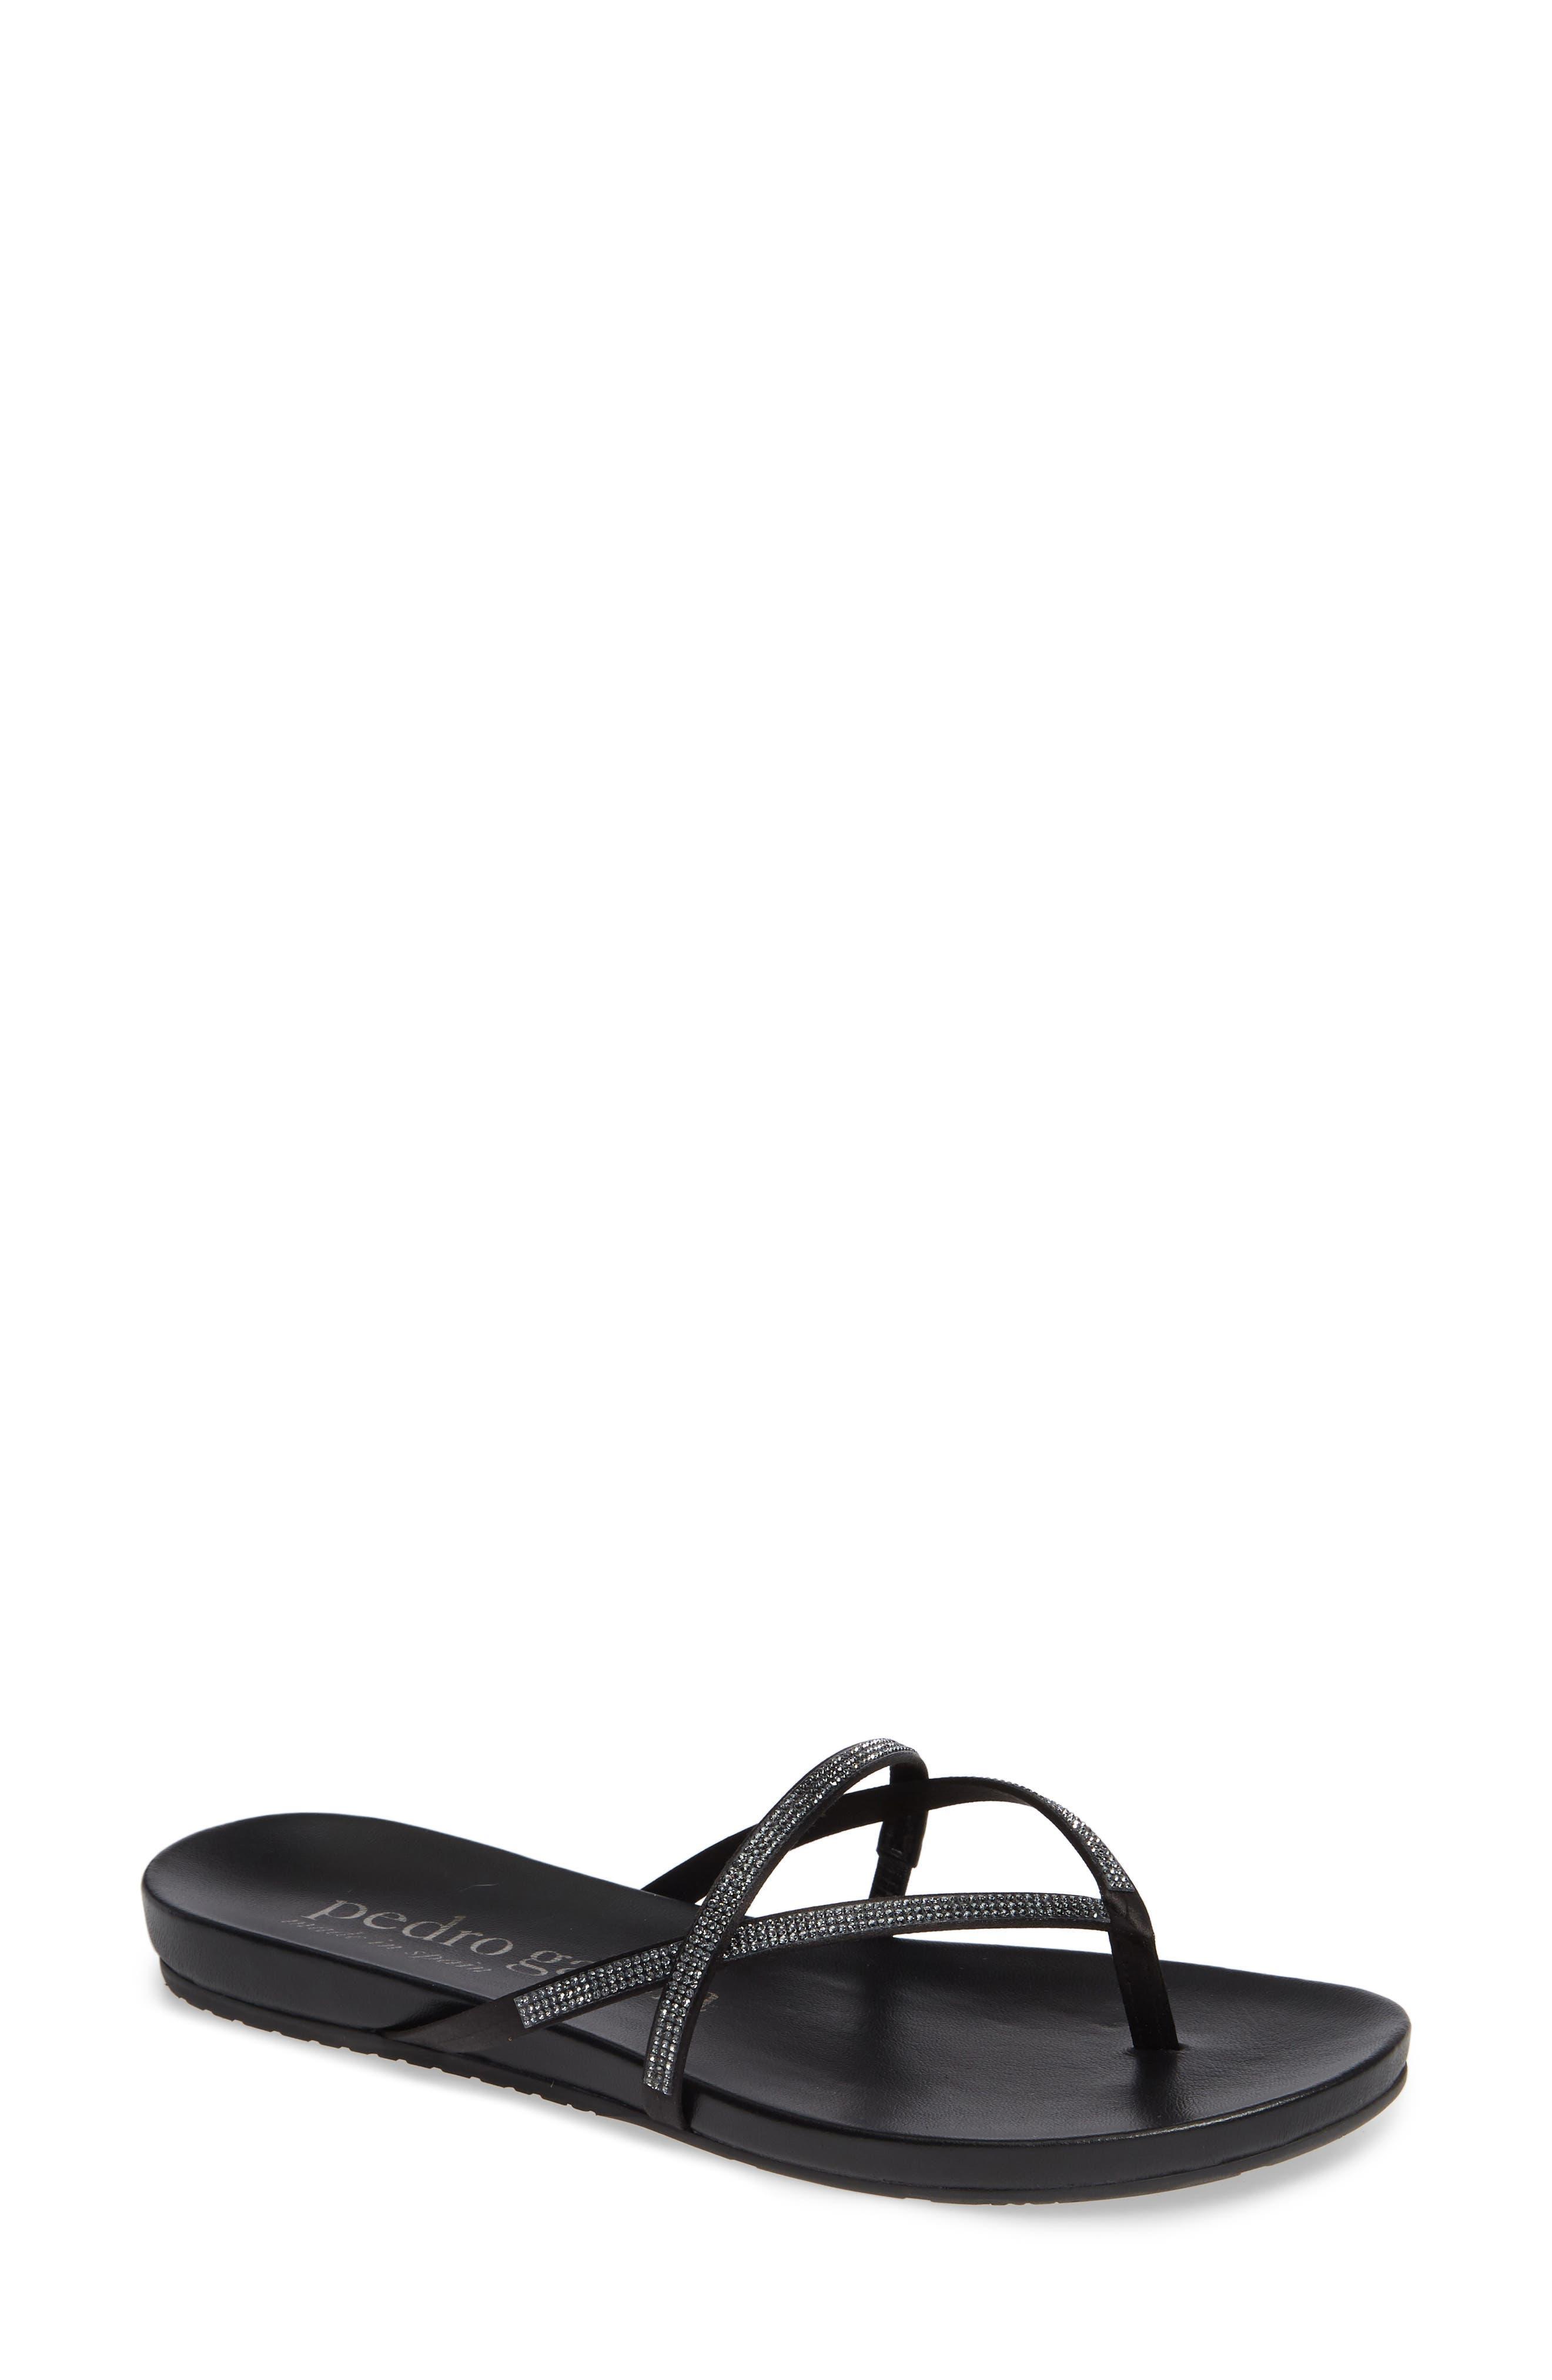 PEDRO GARCIA Giulia Crystal Embellished Sandal, Main, color, METEORITE SATIN